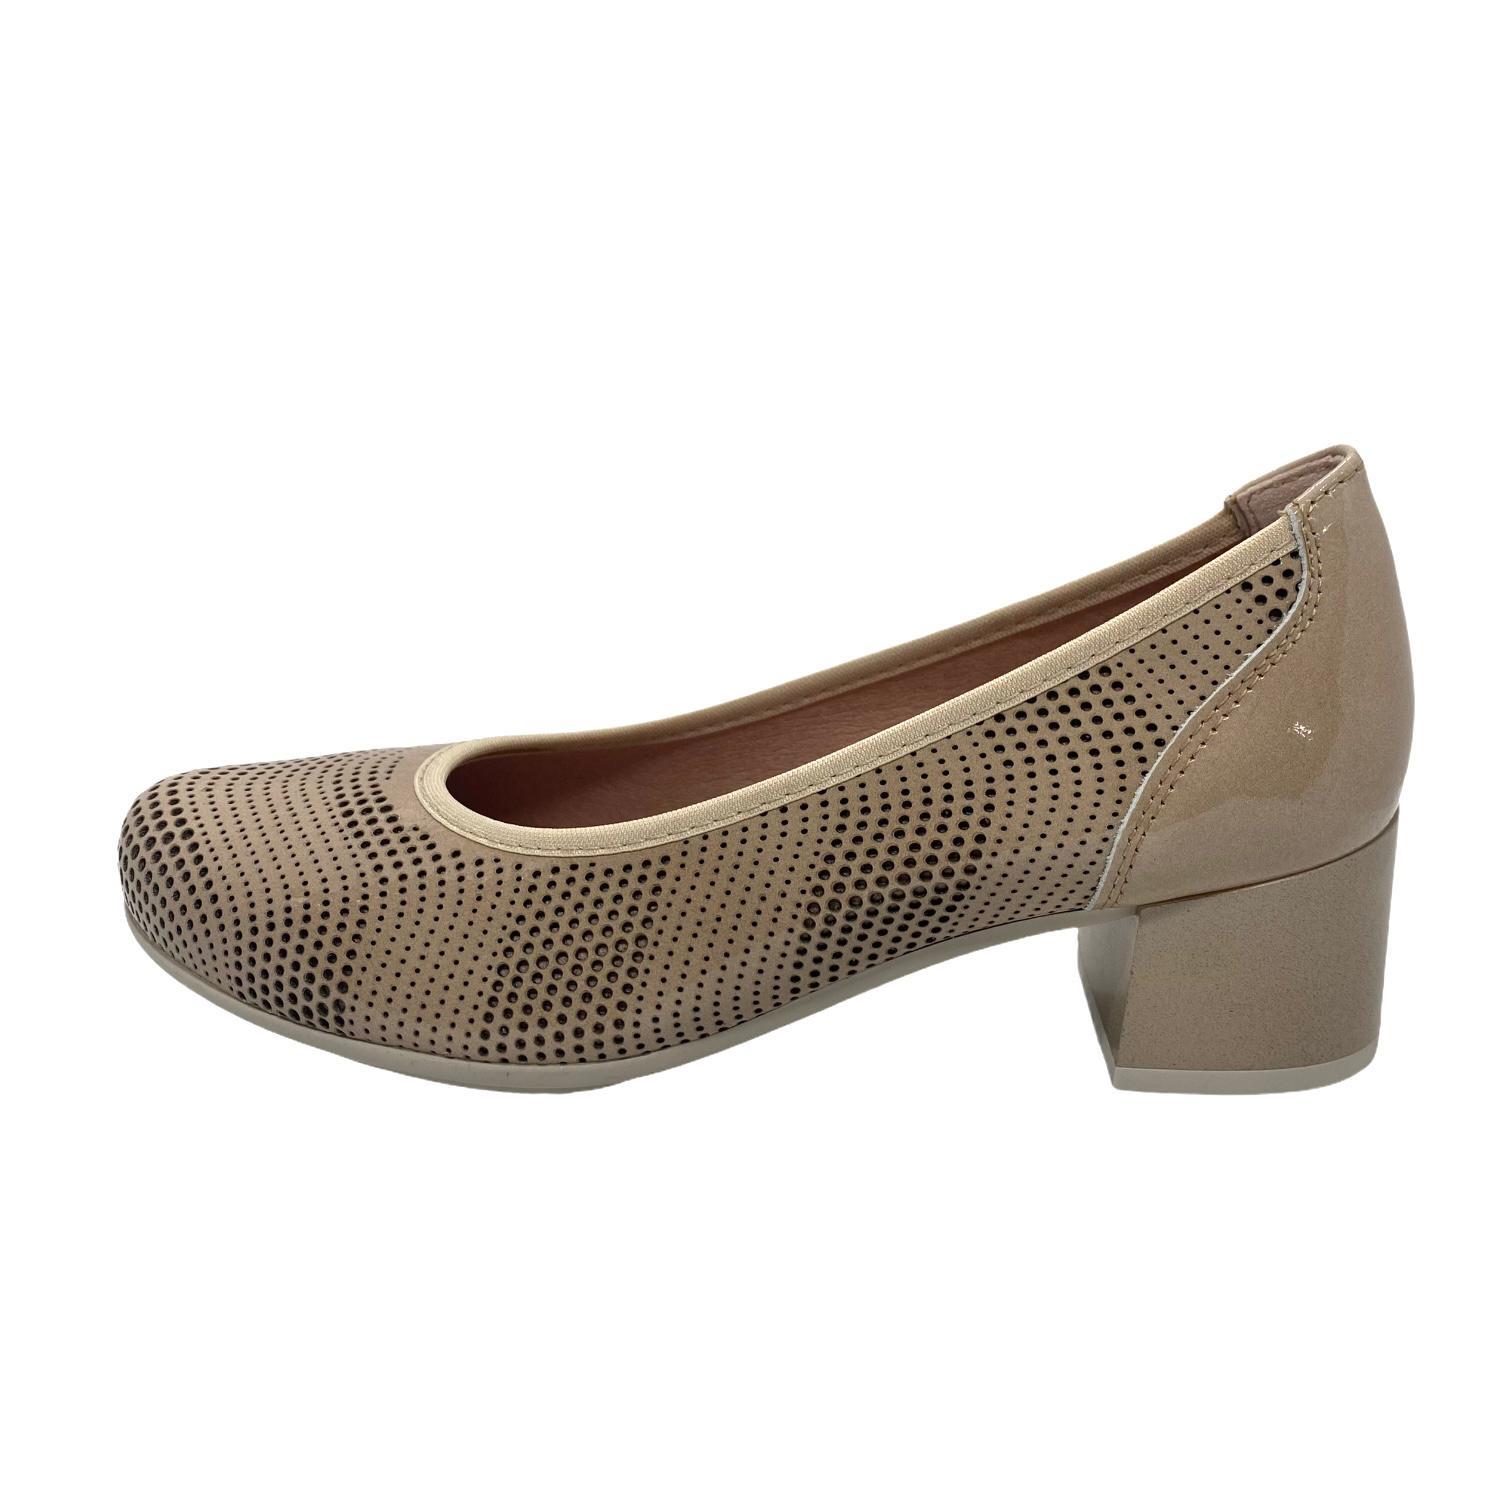 Pantofi Pitillos bej cu perforatii